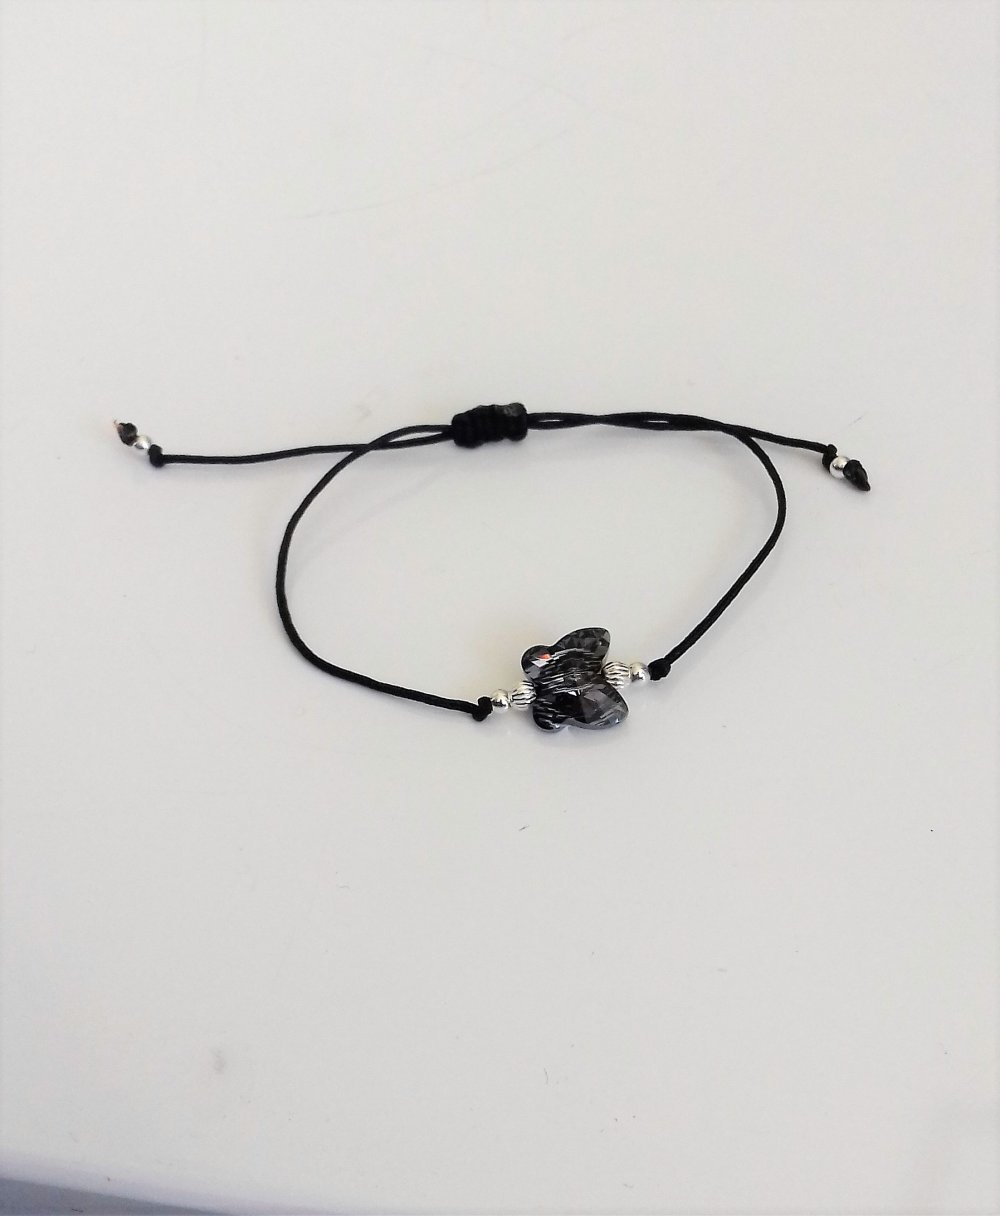 Bracelet  papillon noir cristal swarovski  sur cordon